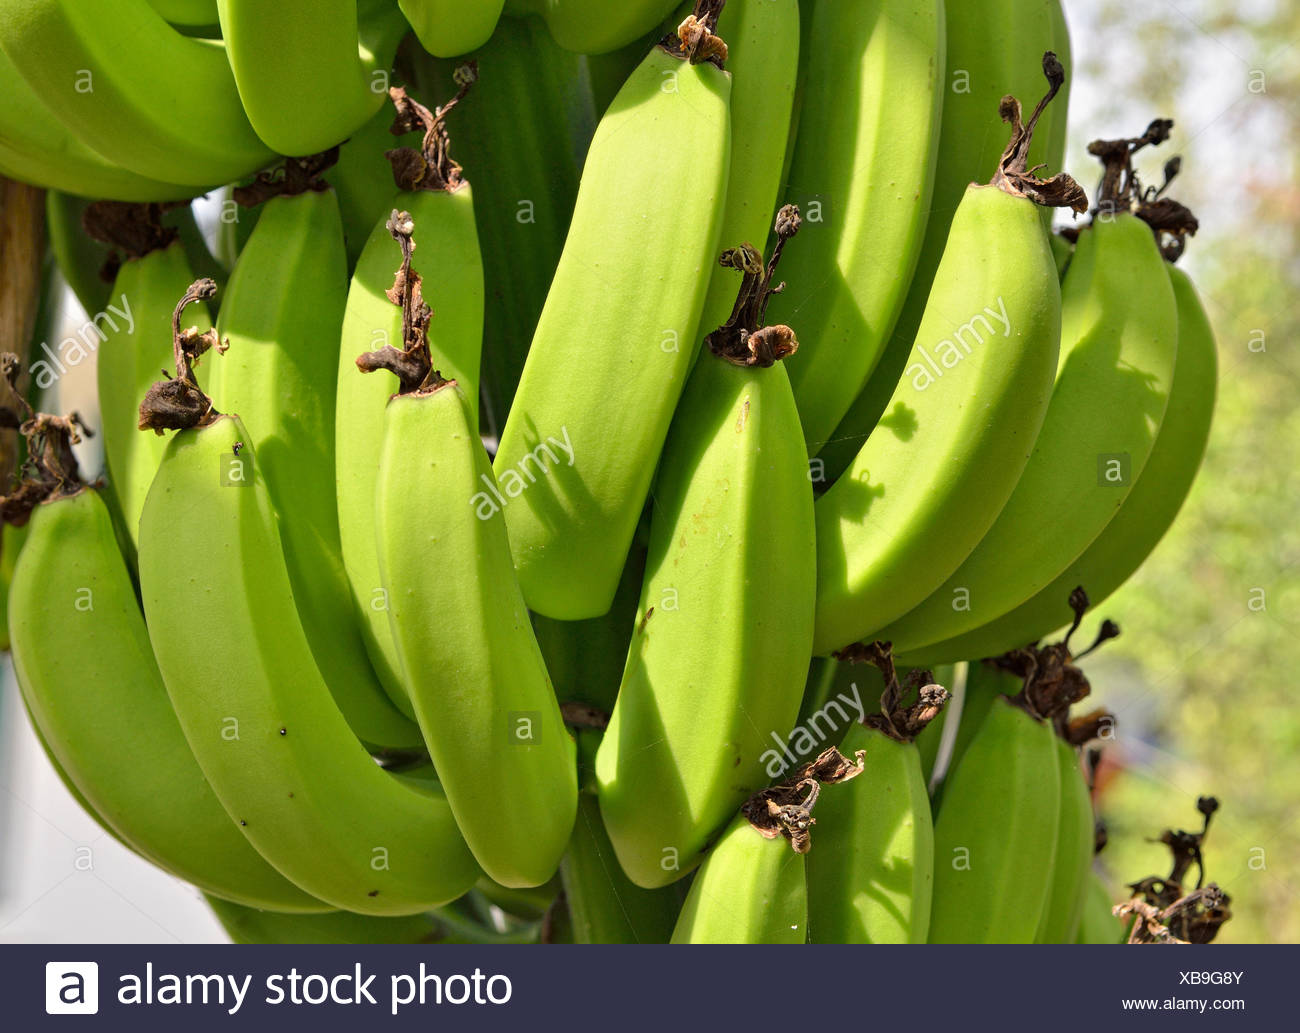 Bananas (Musa sp.), Apazapan, Veracruz, Mexico - Stock Image